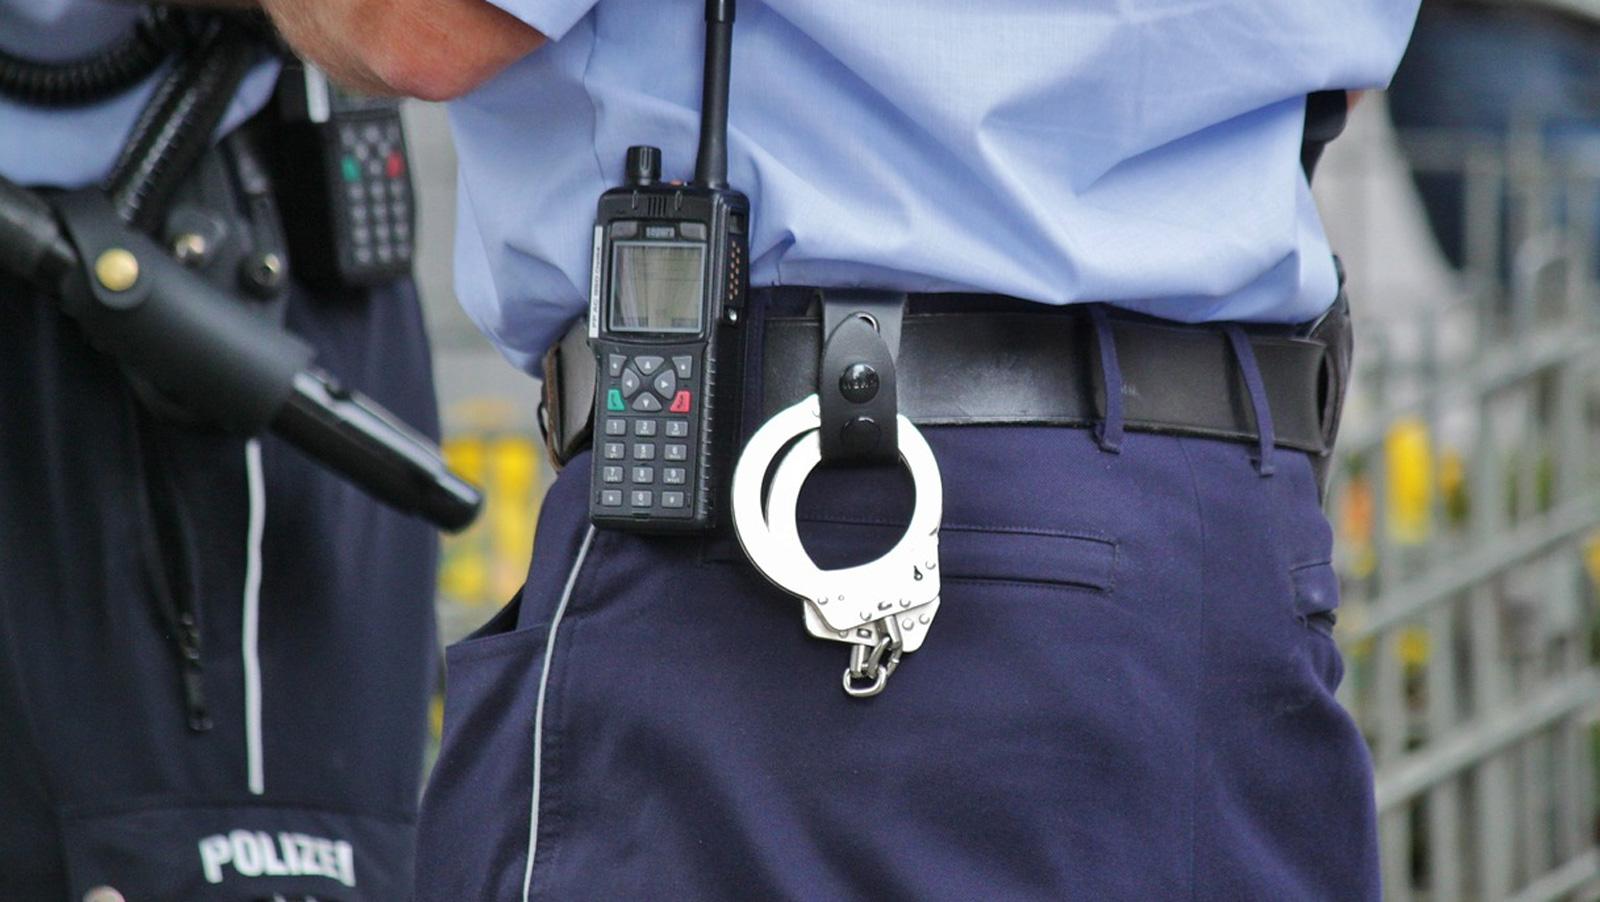 macaus-casino-related-crime-up-14-authorities-get-serious